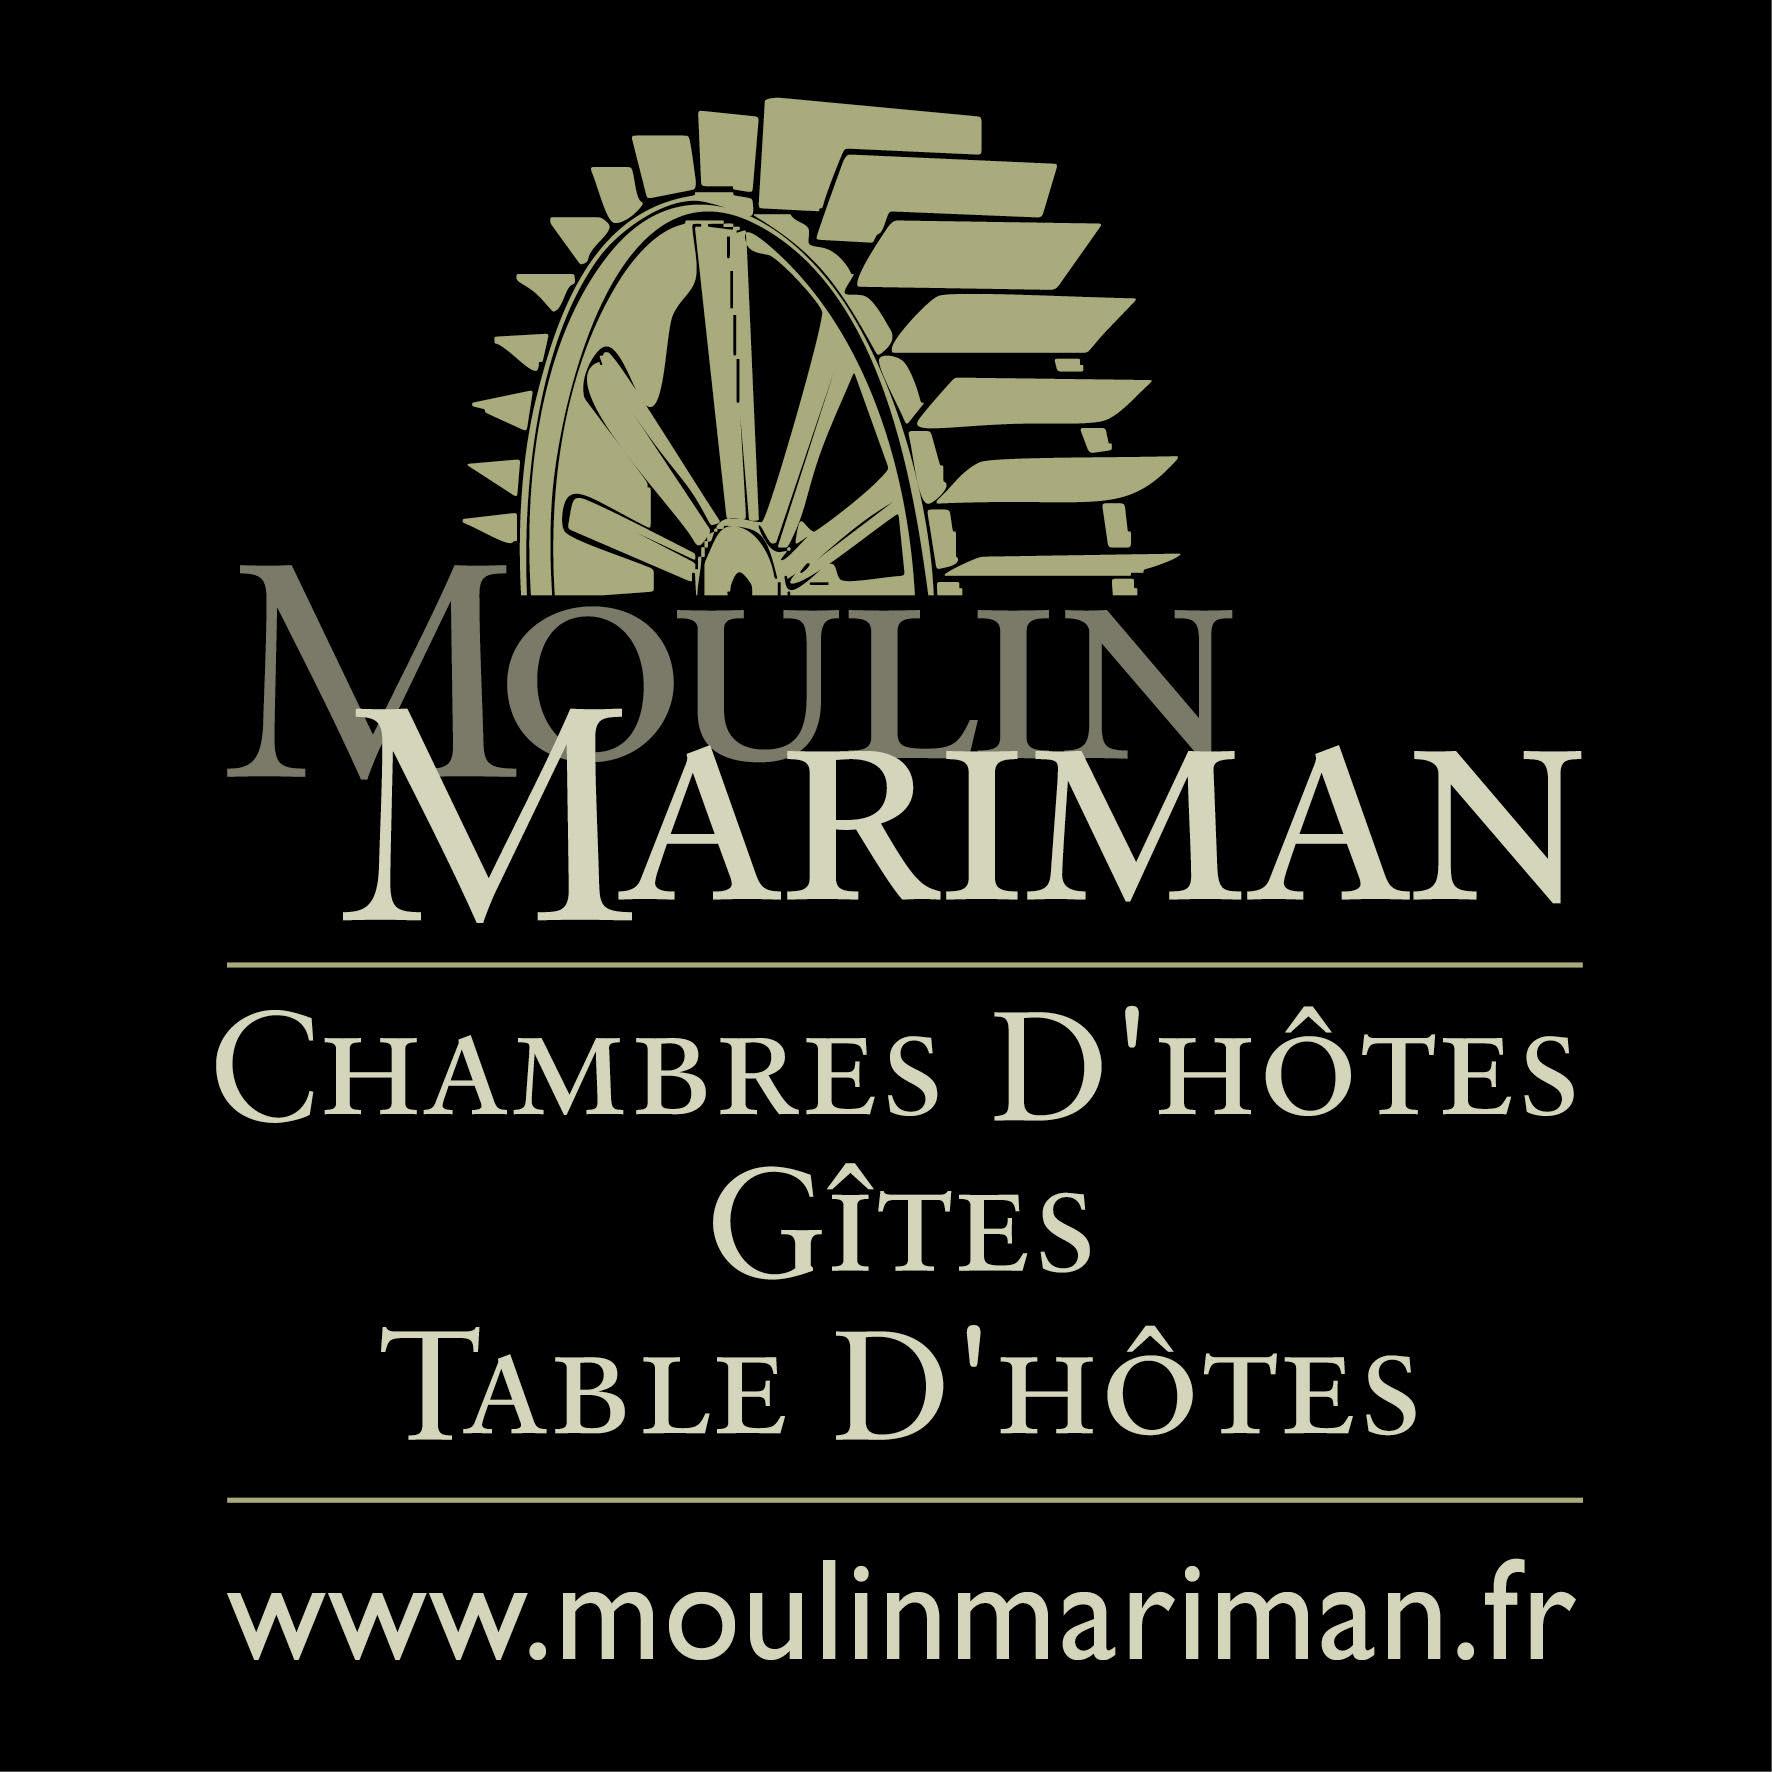 Moulin Mariman Allan